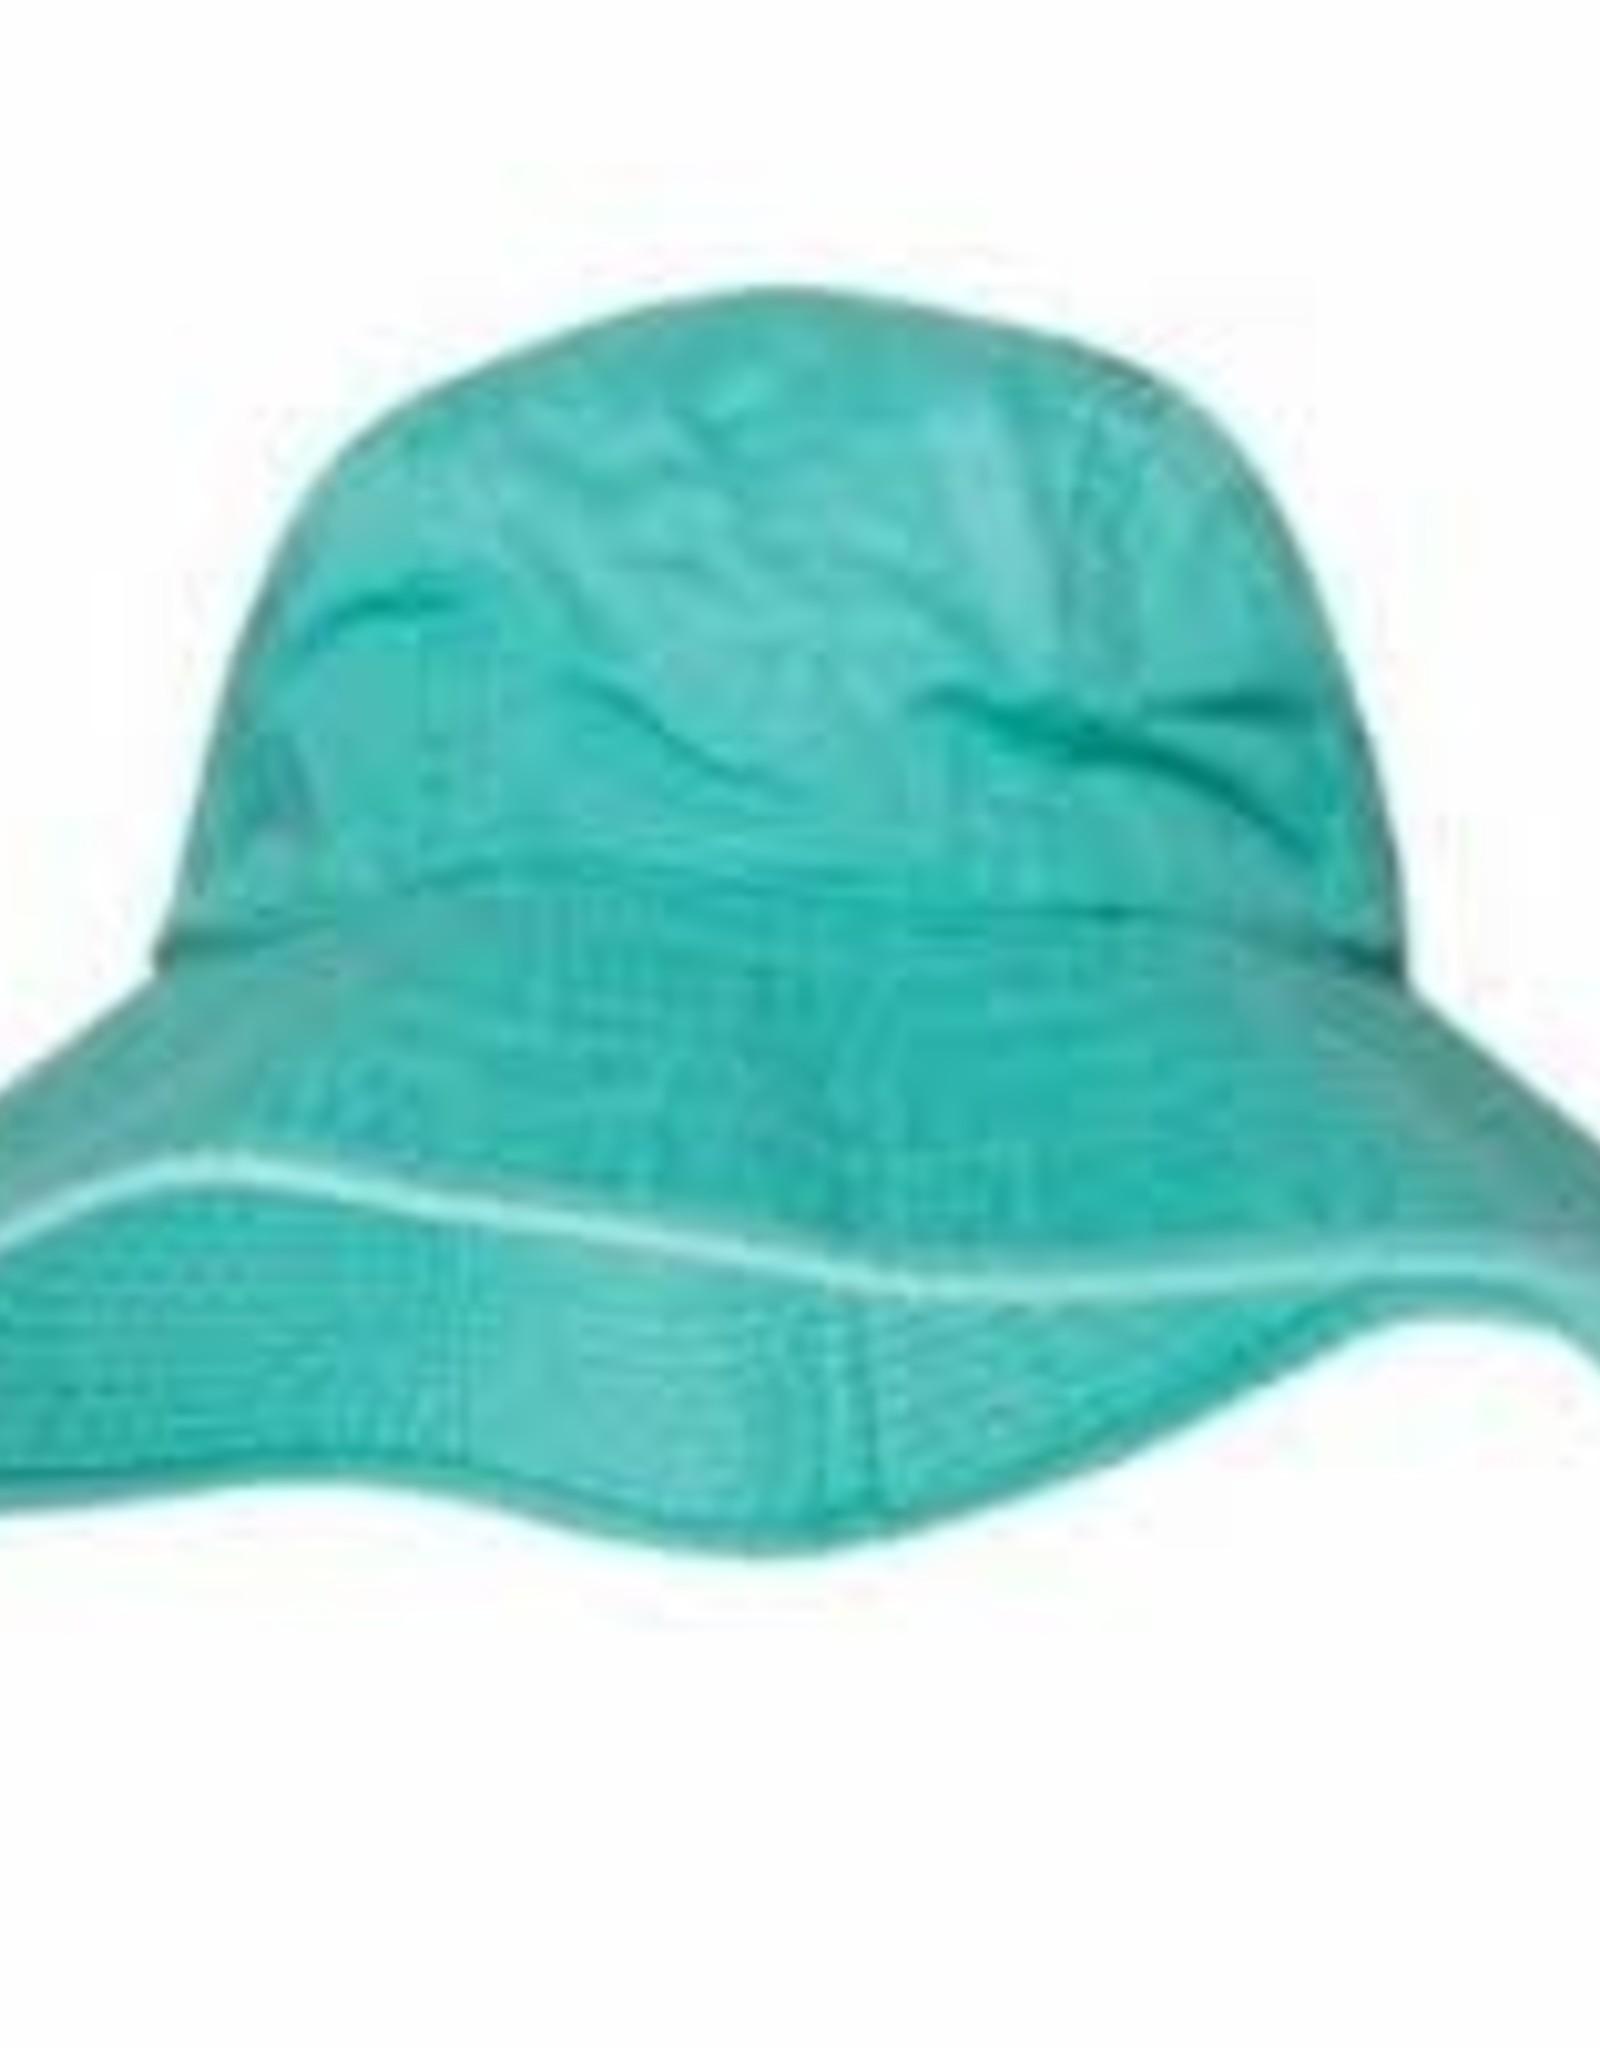 ADAMS TWILL FLOPPY SUN HAT